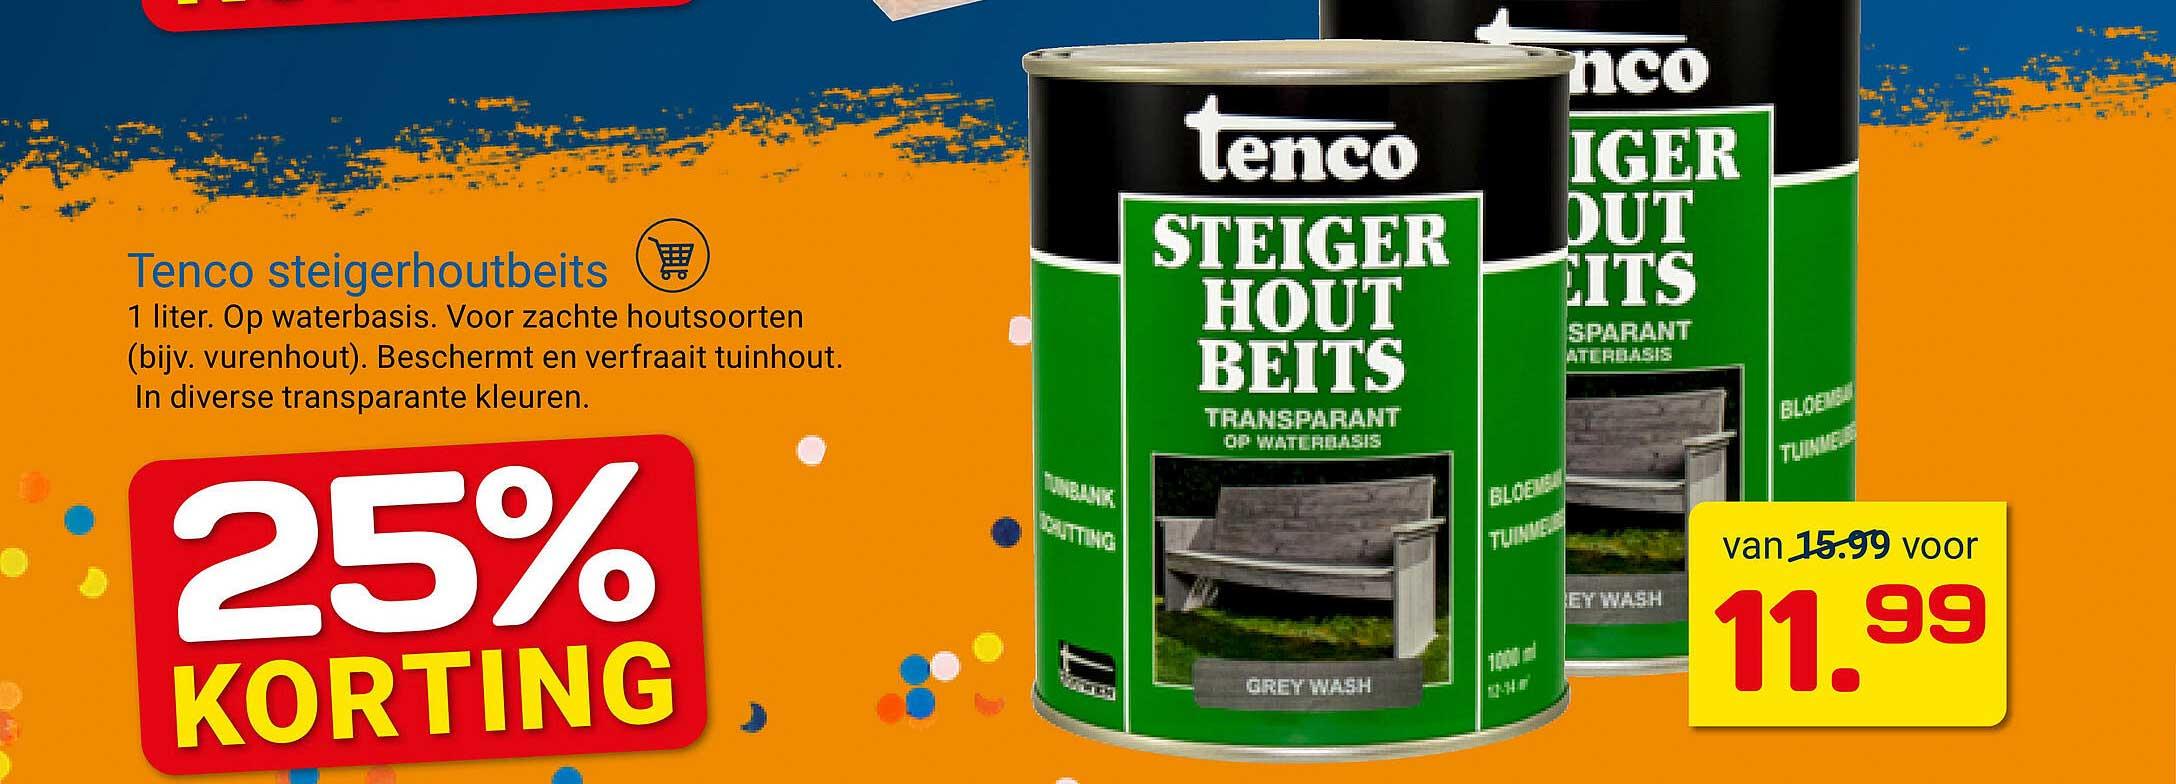 KlusWijs Tenco Steigerhoutbeits 25% Korting